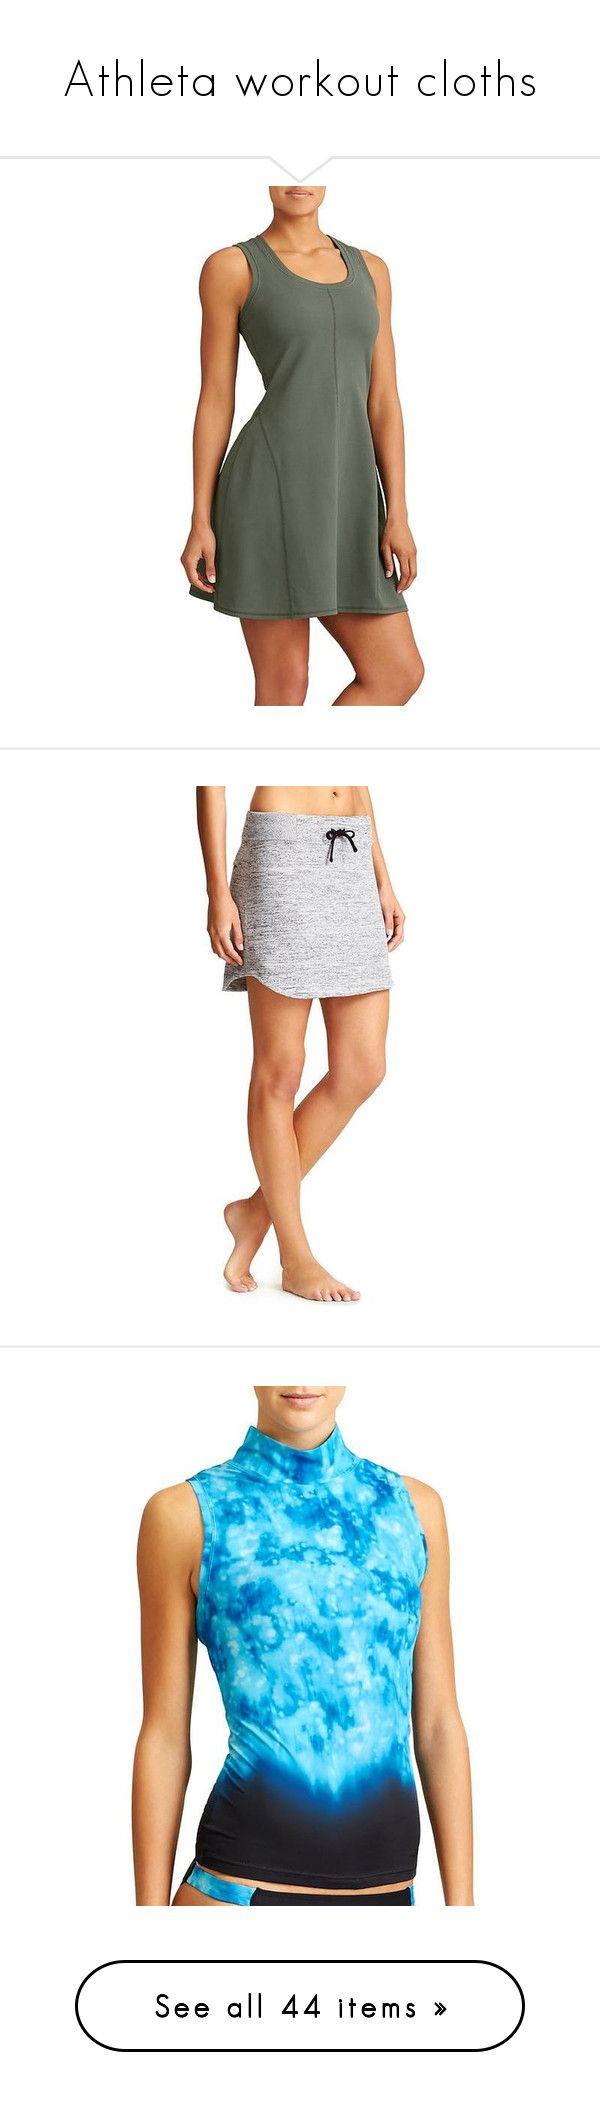 """Athleta workout cloths"" by smalls1776 ❤ liked on Polyvore featuring athleta, activewear, green, athleta sportswear, skirts, grey heather, athleta skirts, swimwear, bora bora blue and boardshorts"